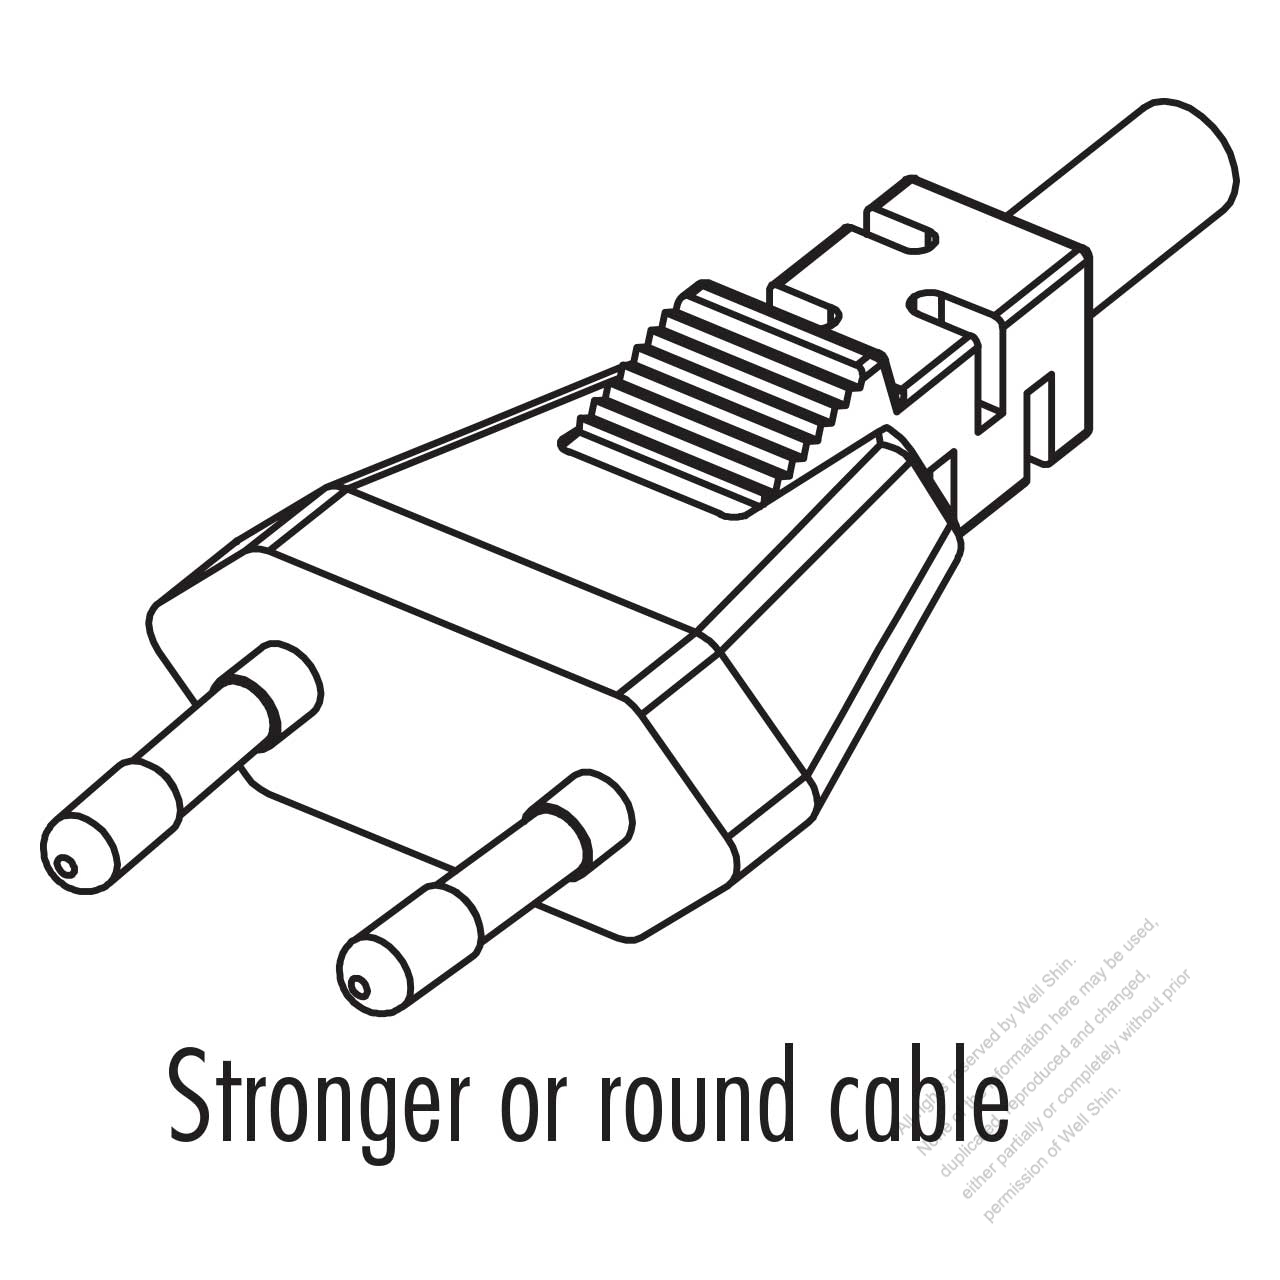 norway 2 pin straight ac plug 2 5a 250v well shin technology co AC Cord Diagram norway 2 pin straight ac plug 2 5a 250v